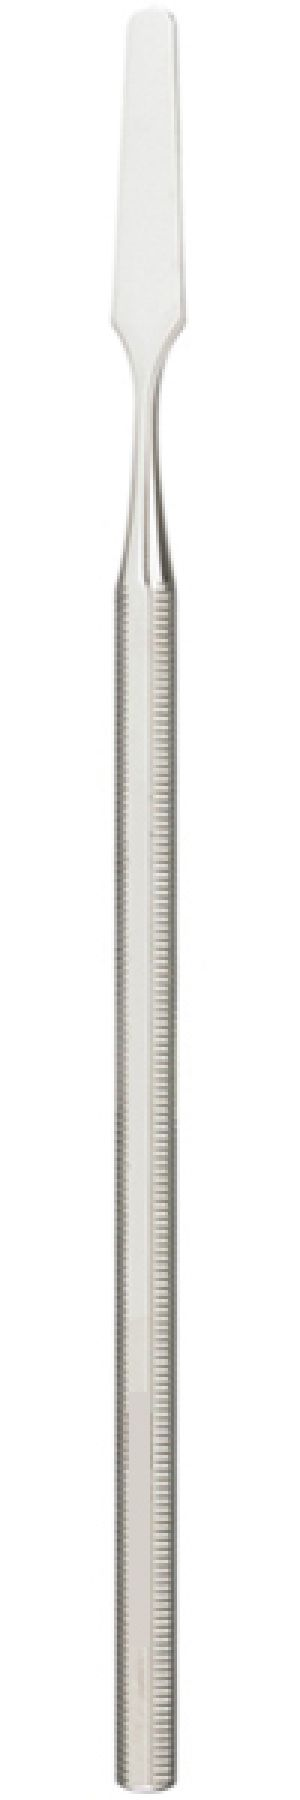 MI-66-101 Dental Cement Spatula